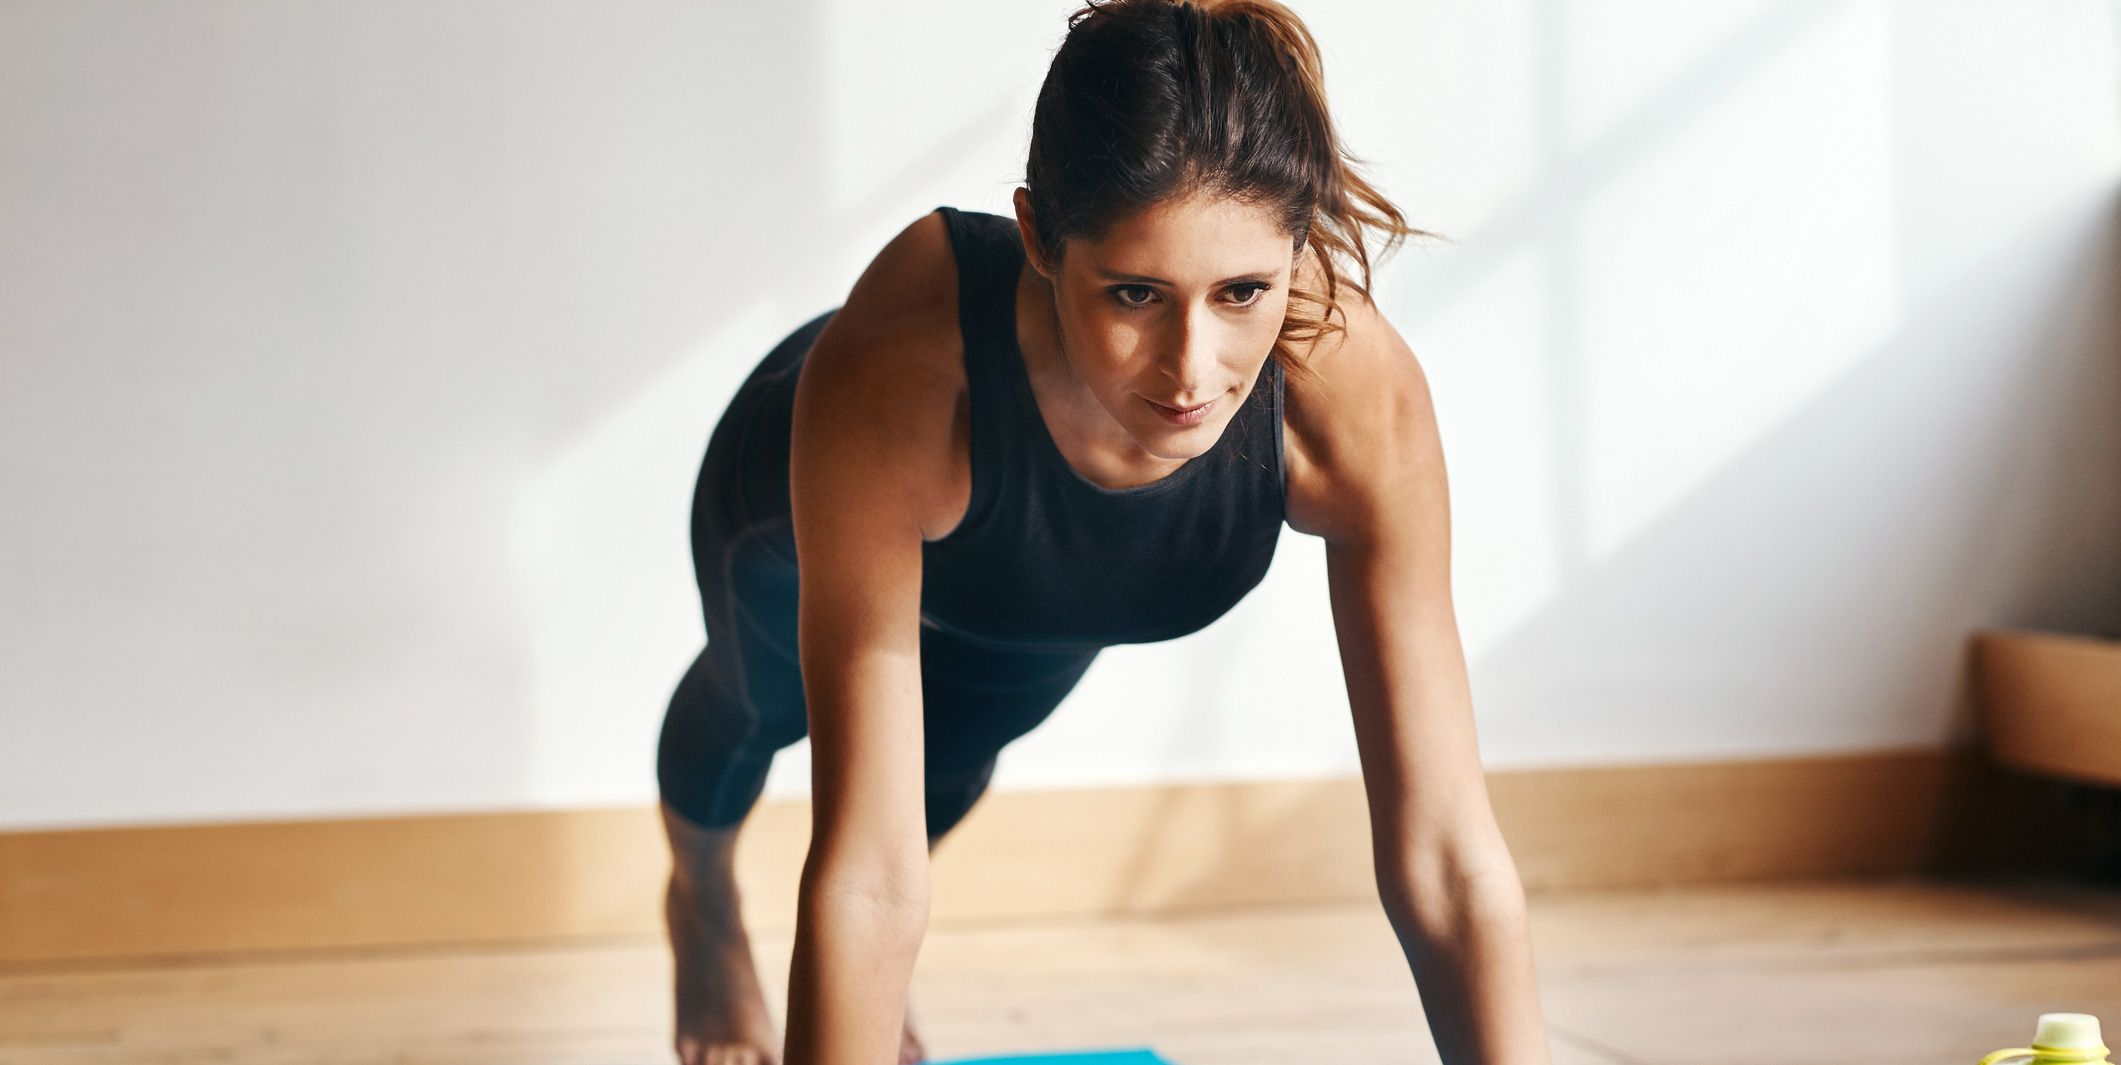 Joe Wicks Cardio Workout